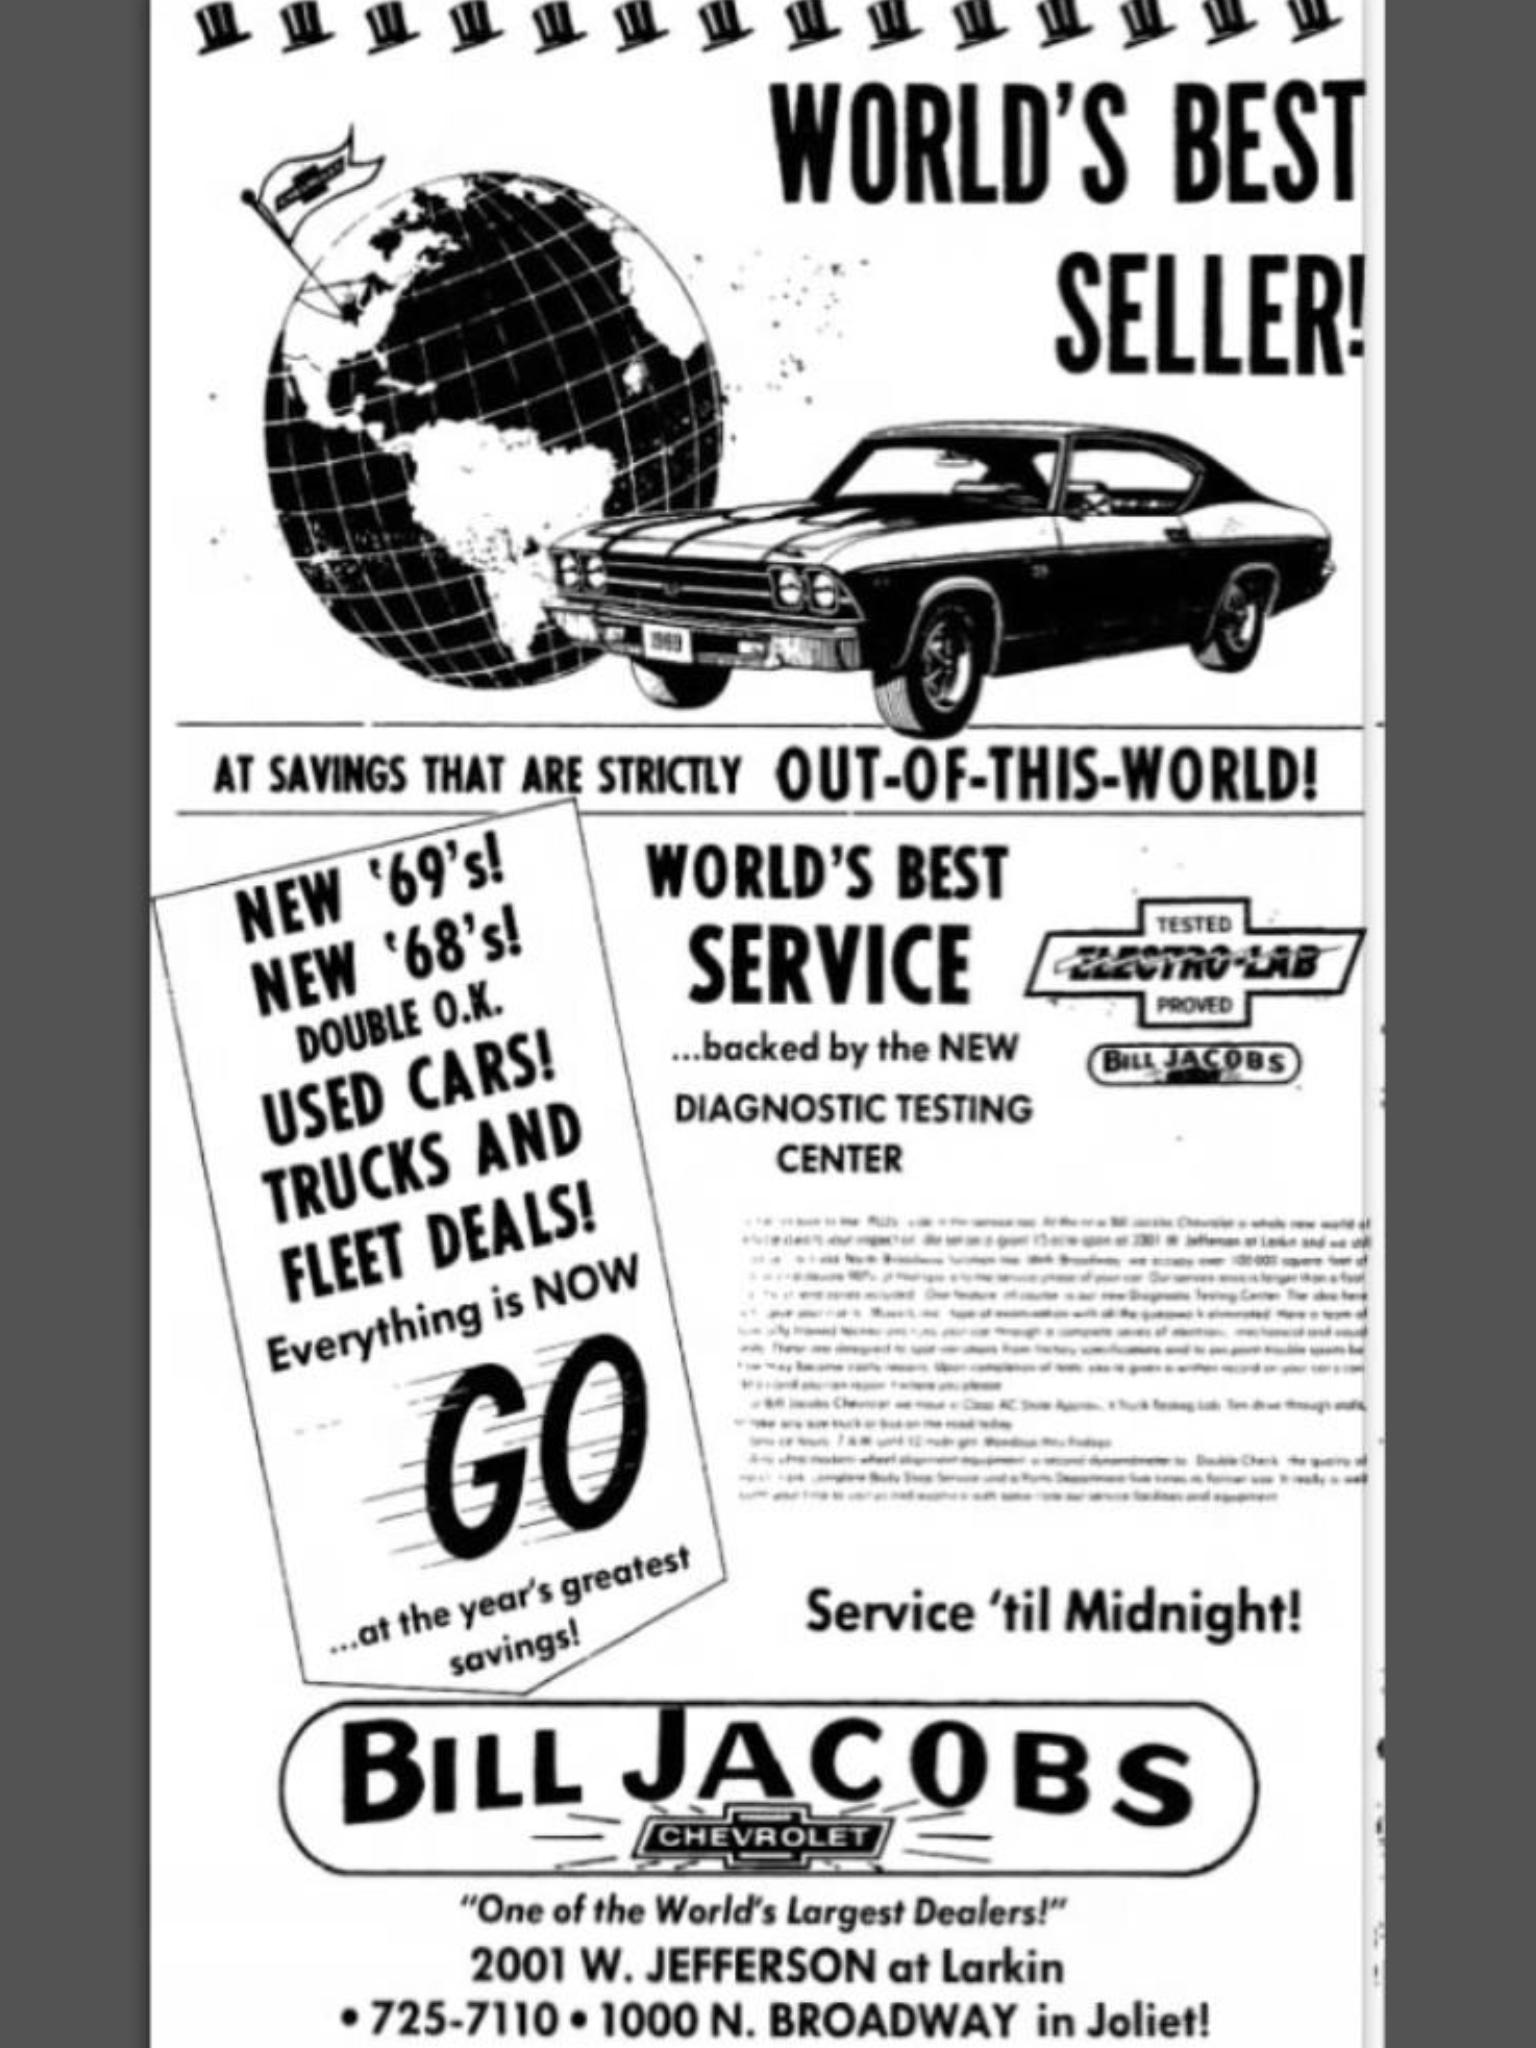 1969 Bill Jacobs Chevrolet Dealership Joliet Illinois